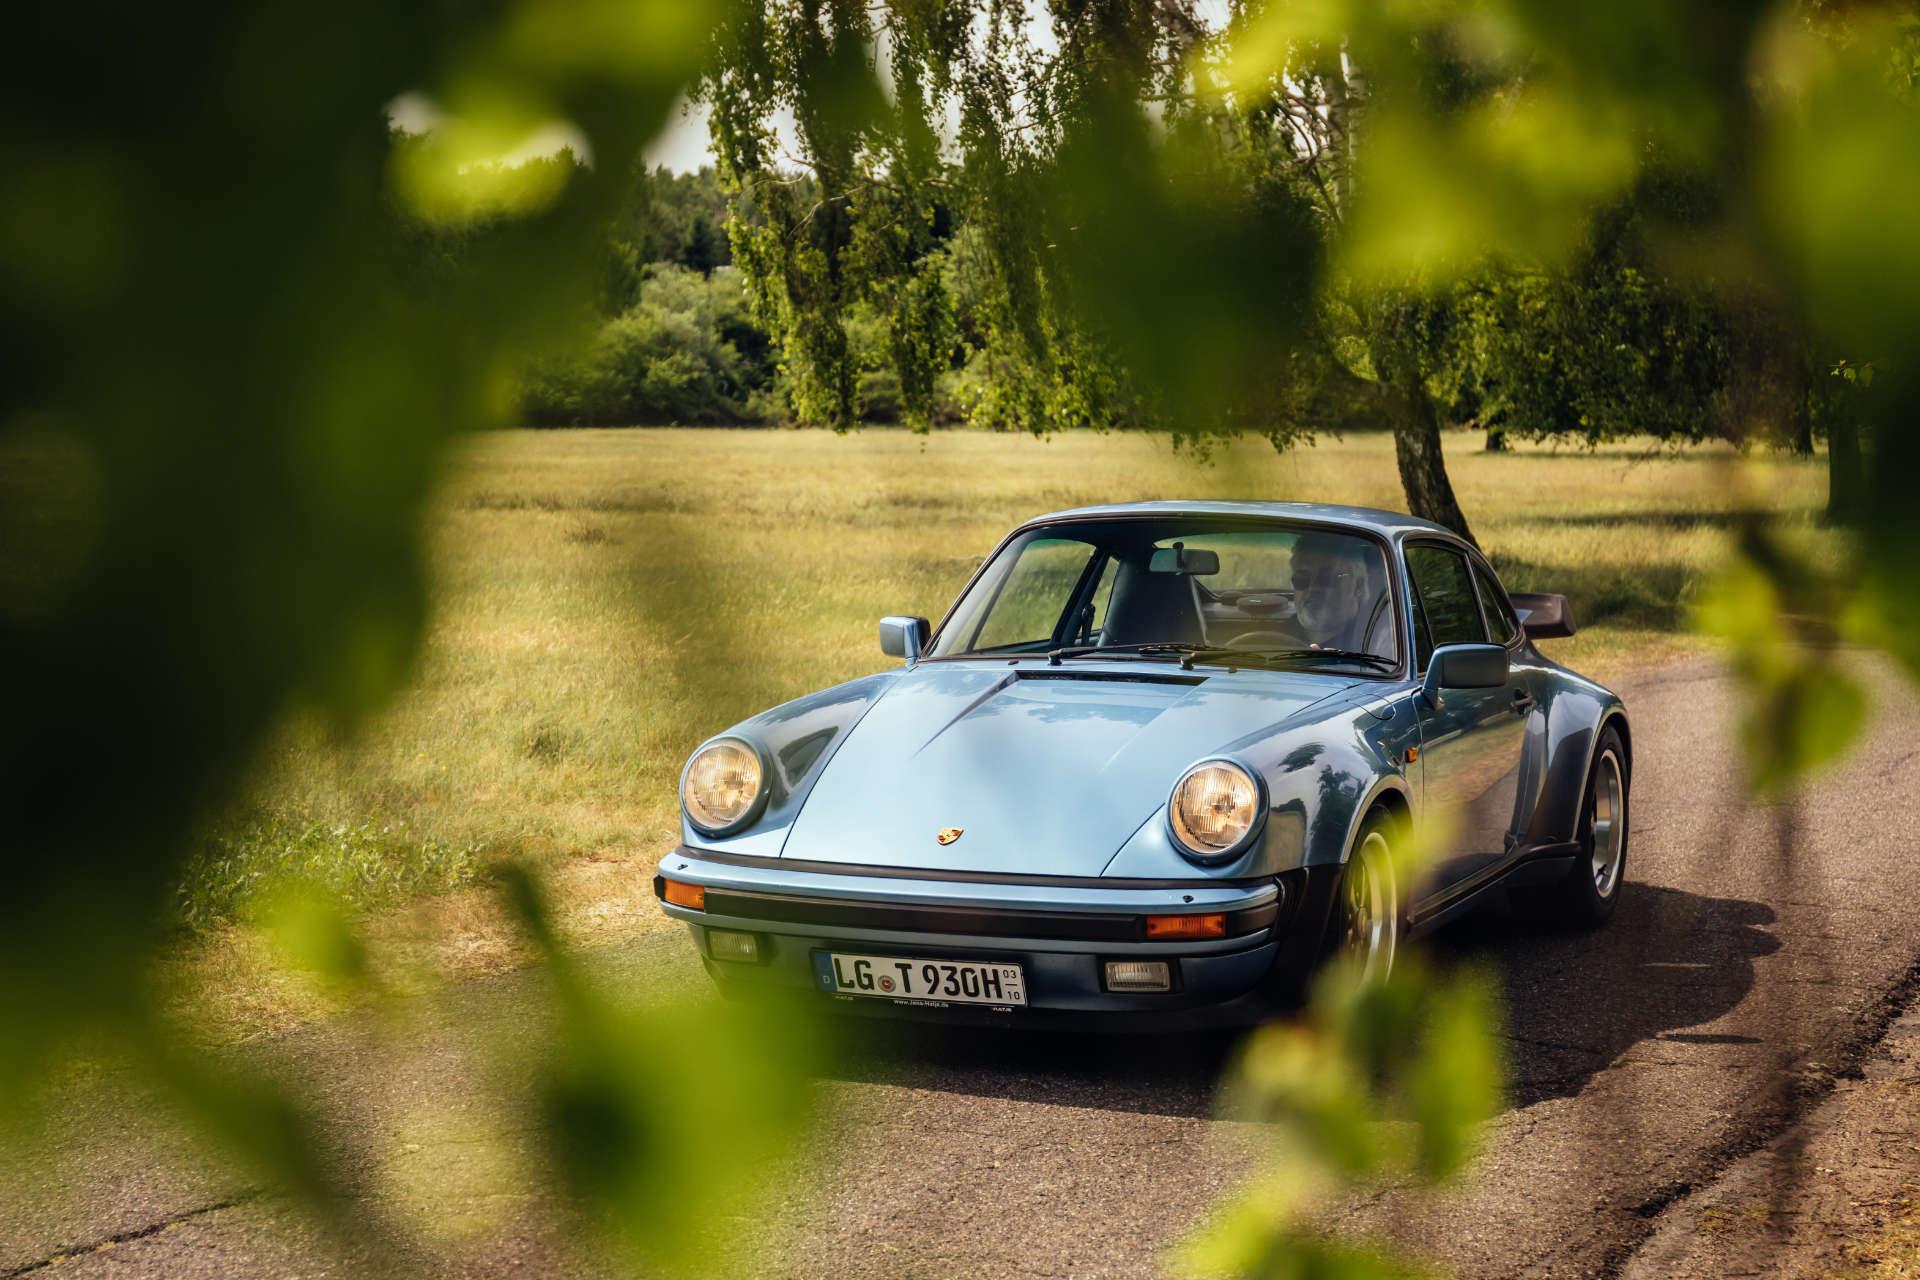 Porsche 911 Turbo 3.3 - Front